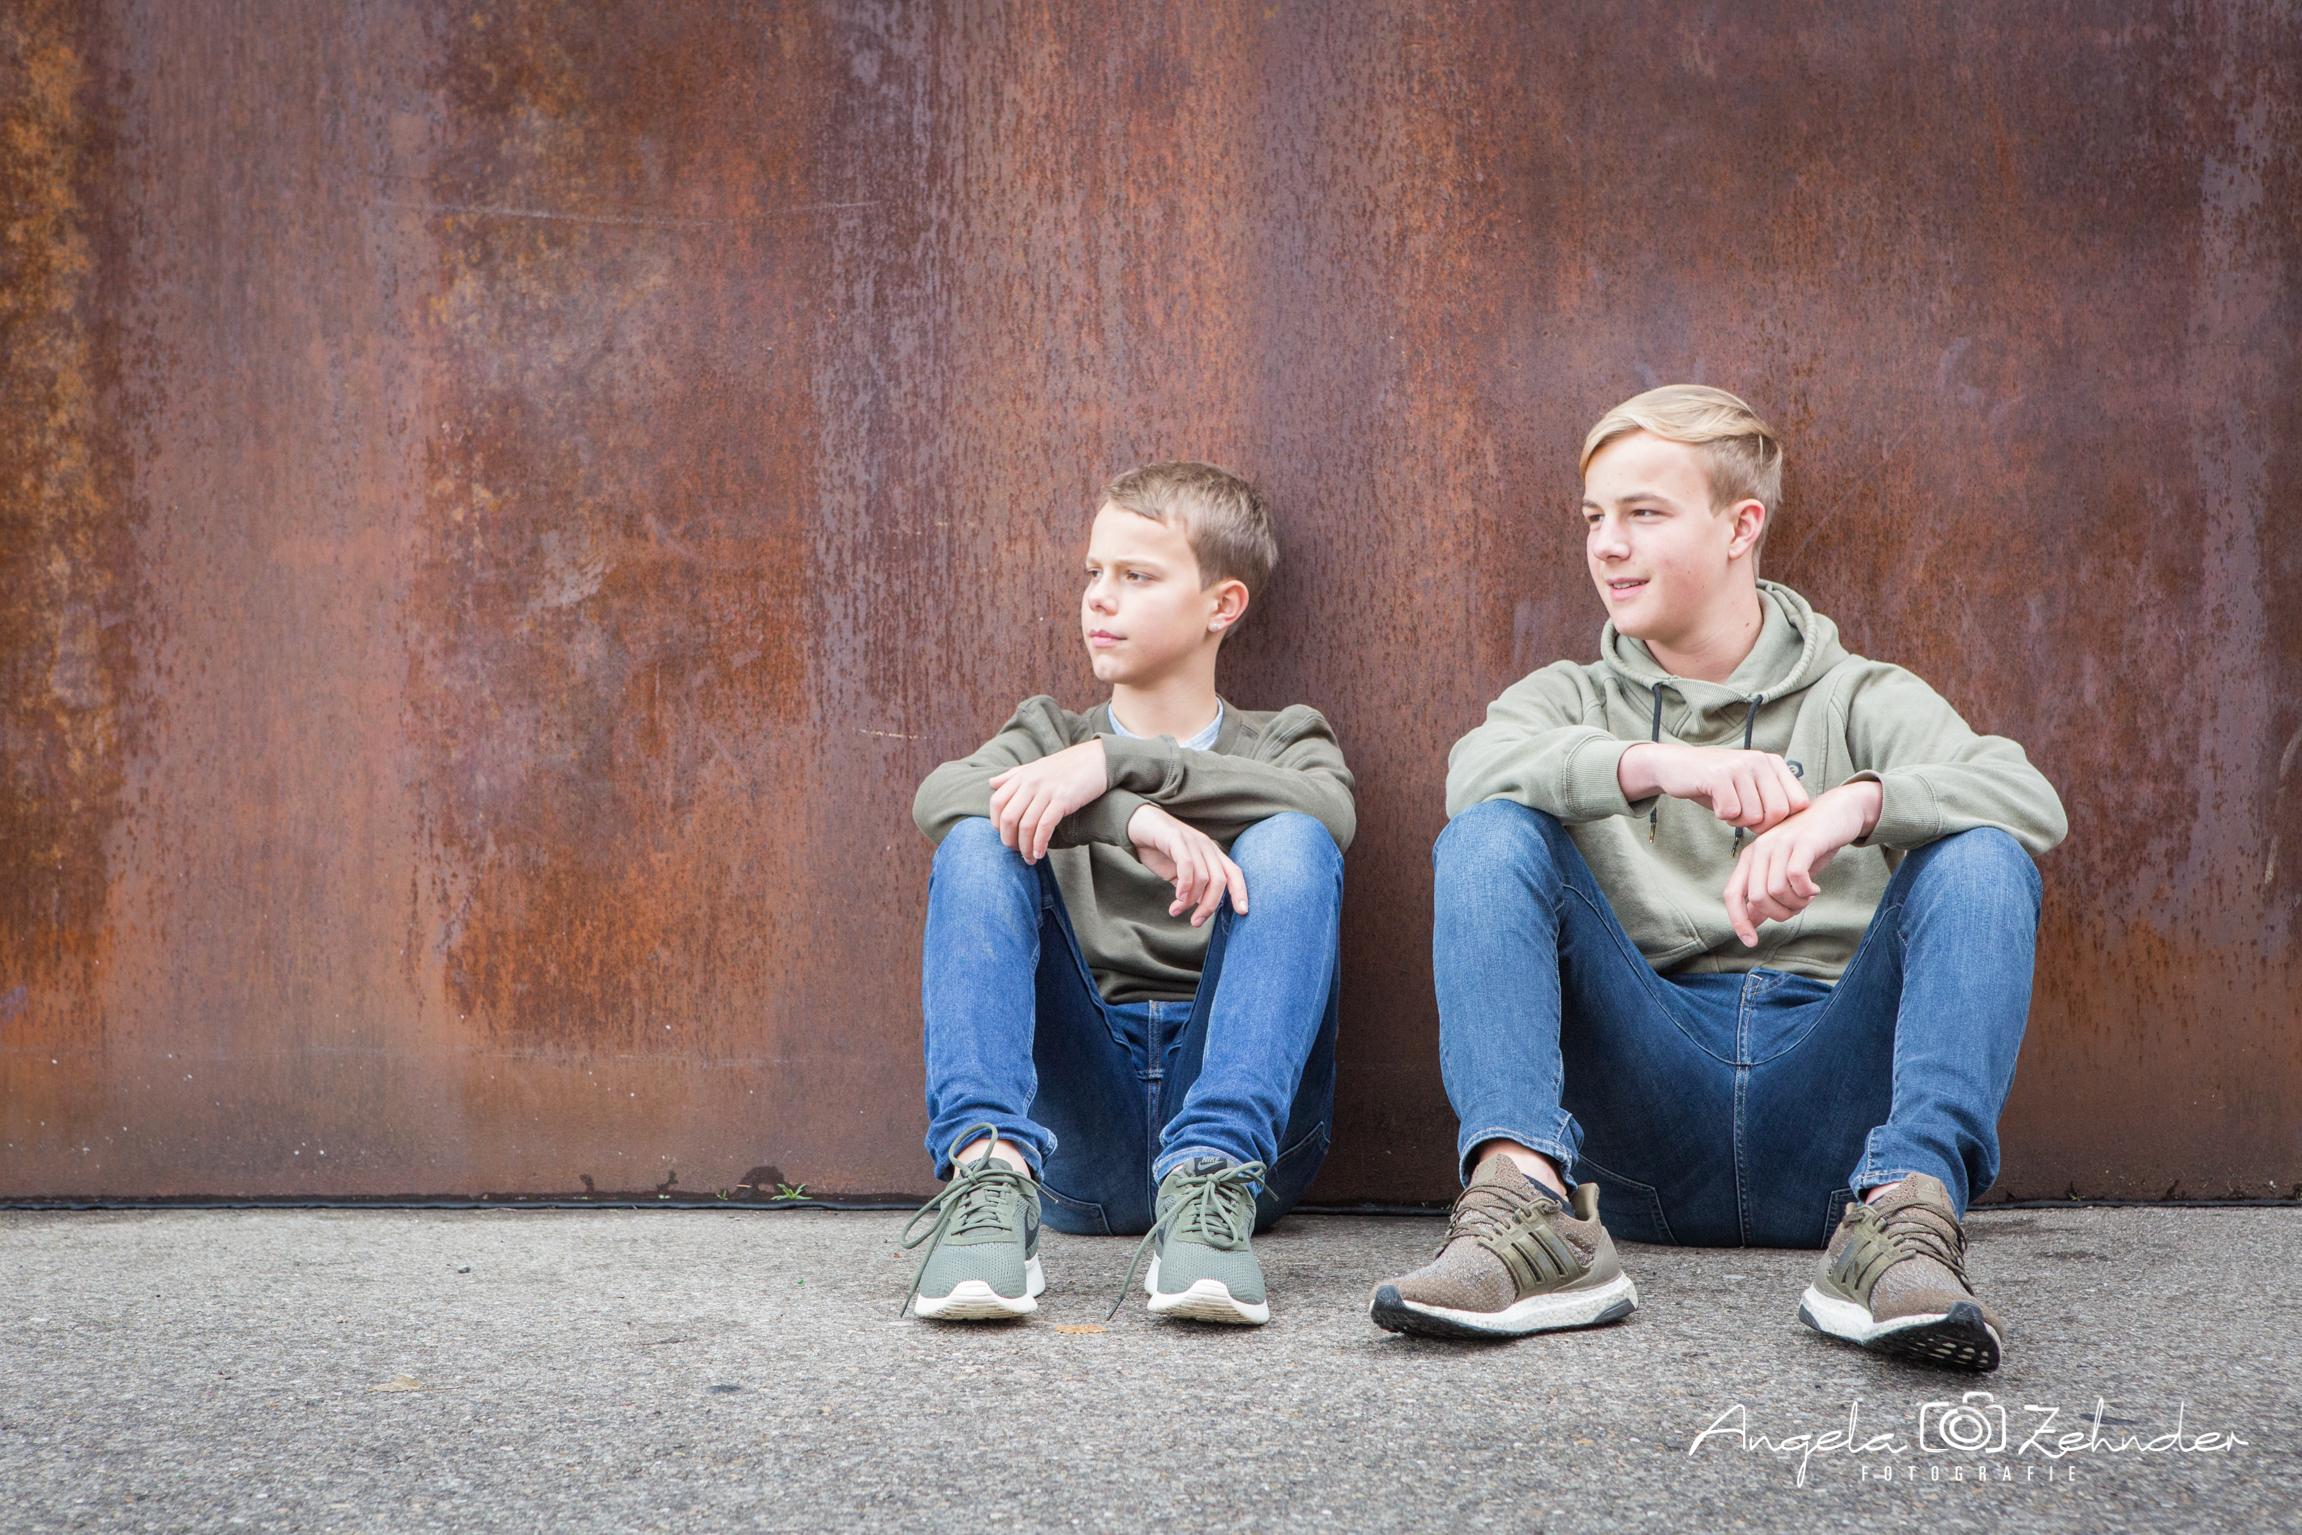 angel-zehnder-fotografie-kids-35